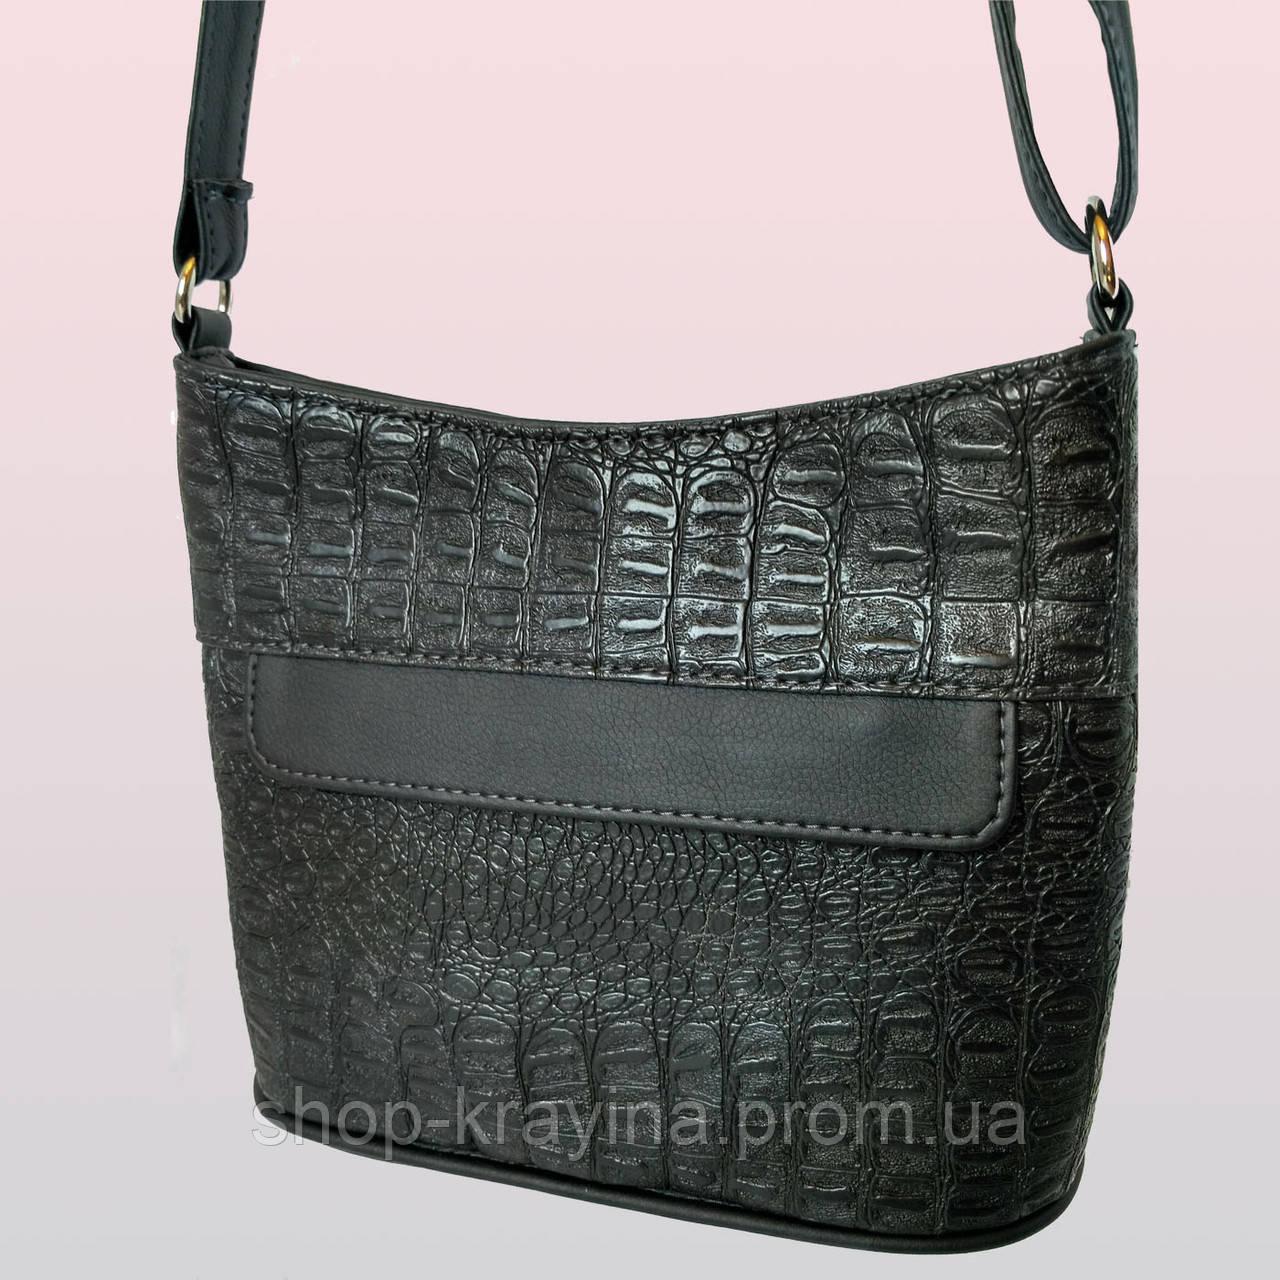 Cумка black aligator 20*23*6 см